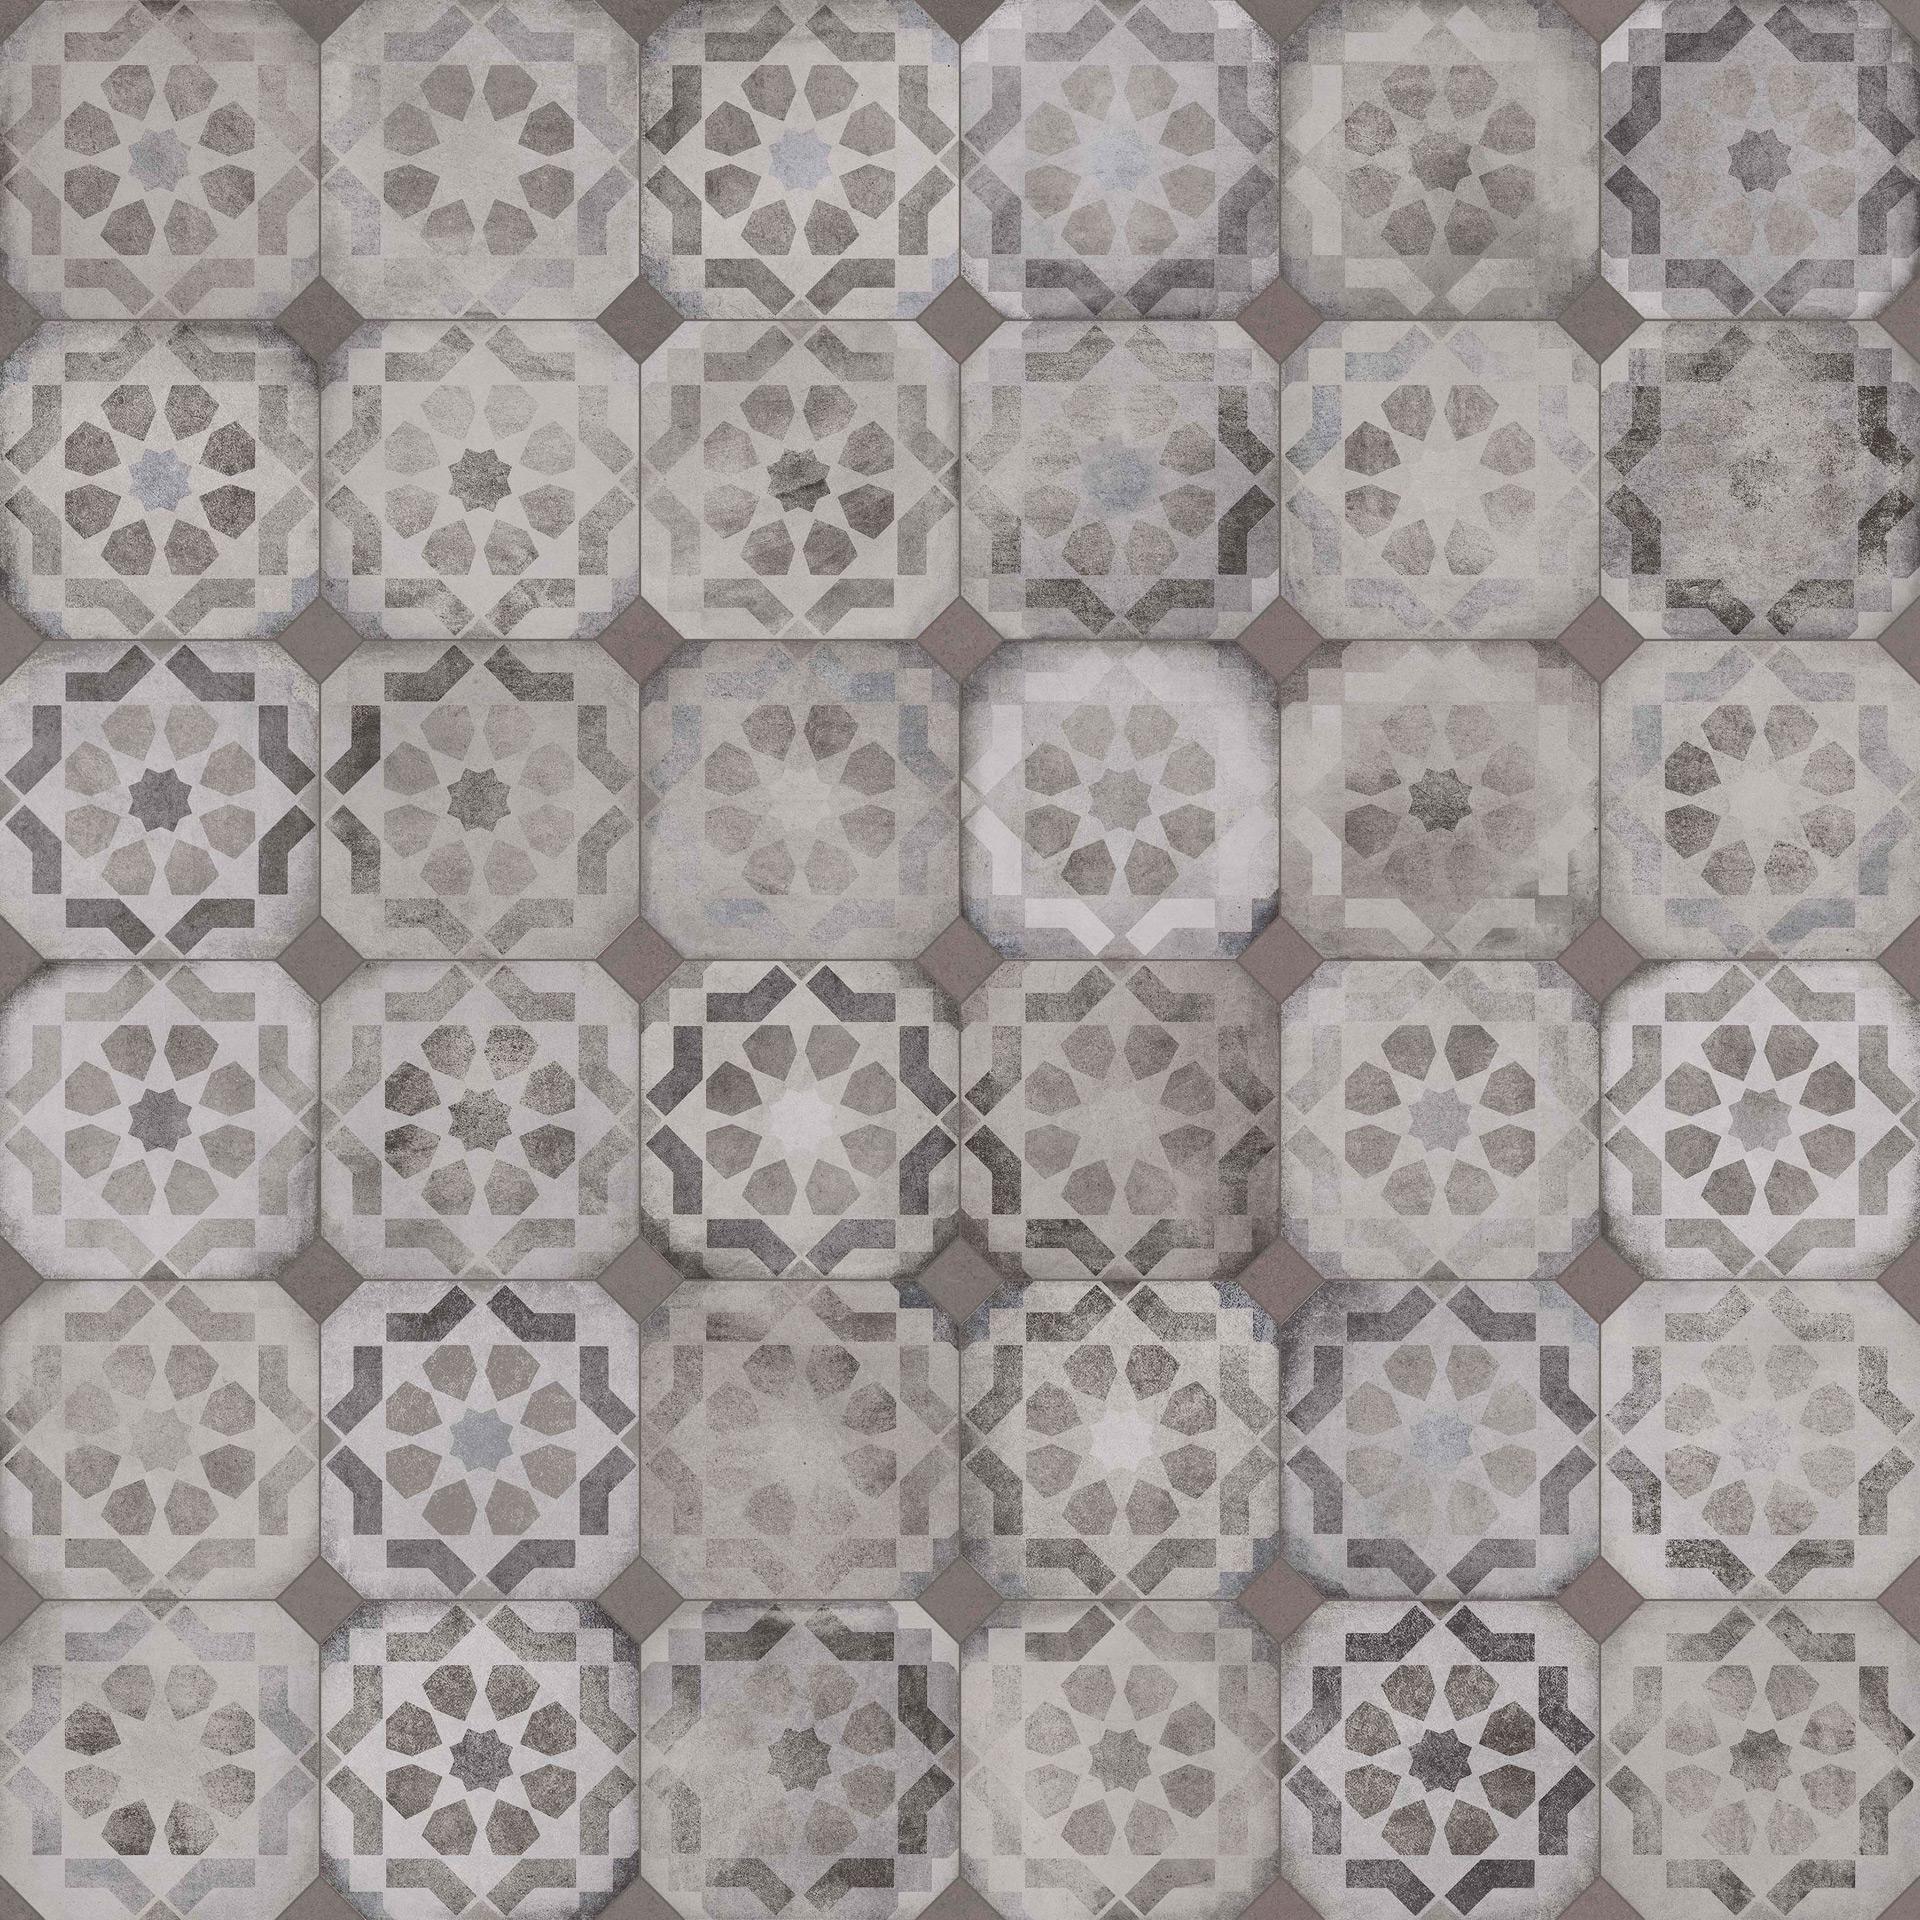 Klinker oktagon turgis sombra 20x20   kakel online tiles r us ab